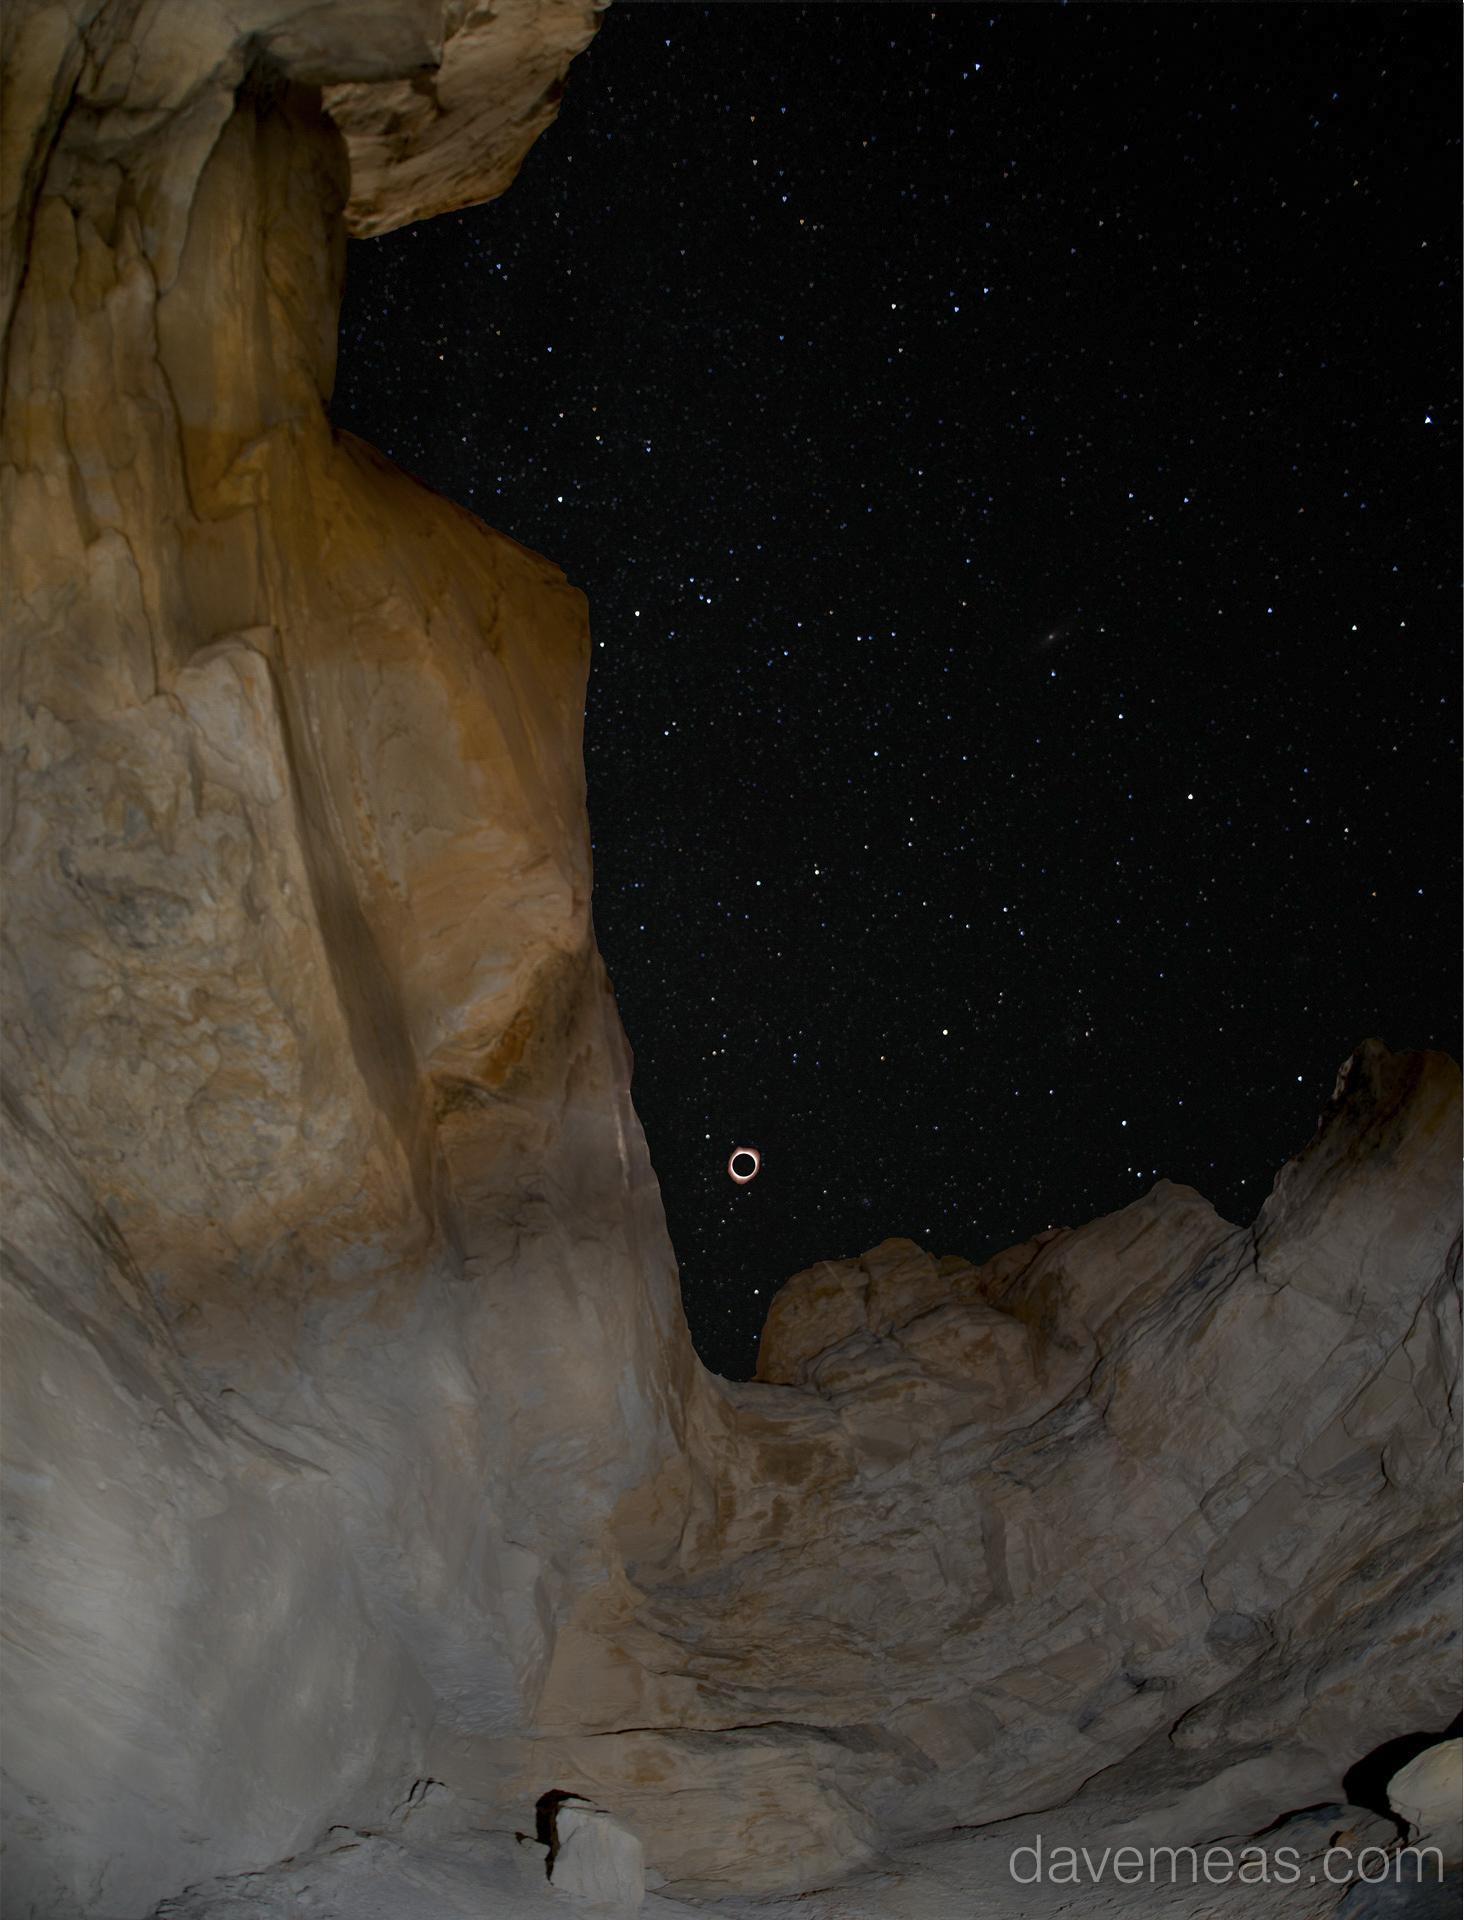 eclipse photos 12 (1 of 1).jpg